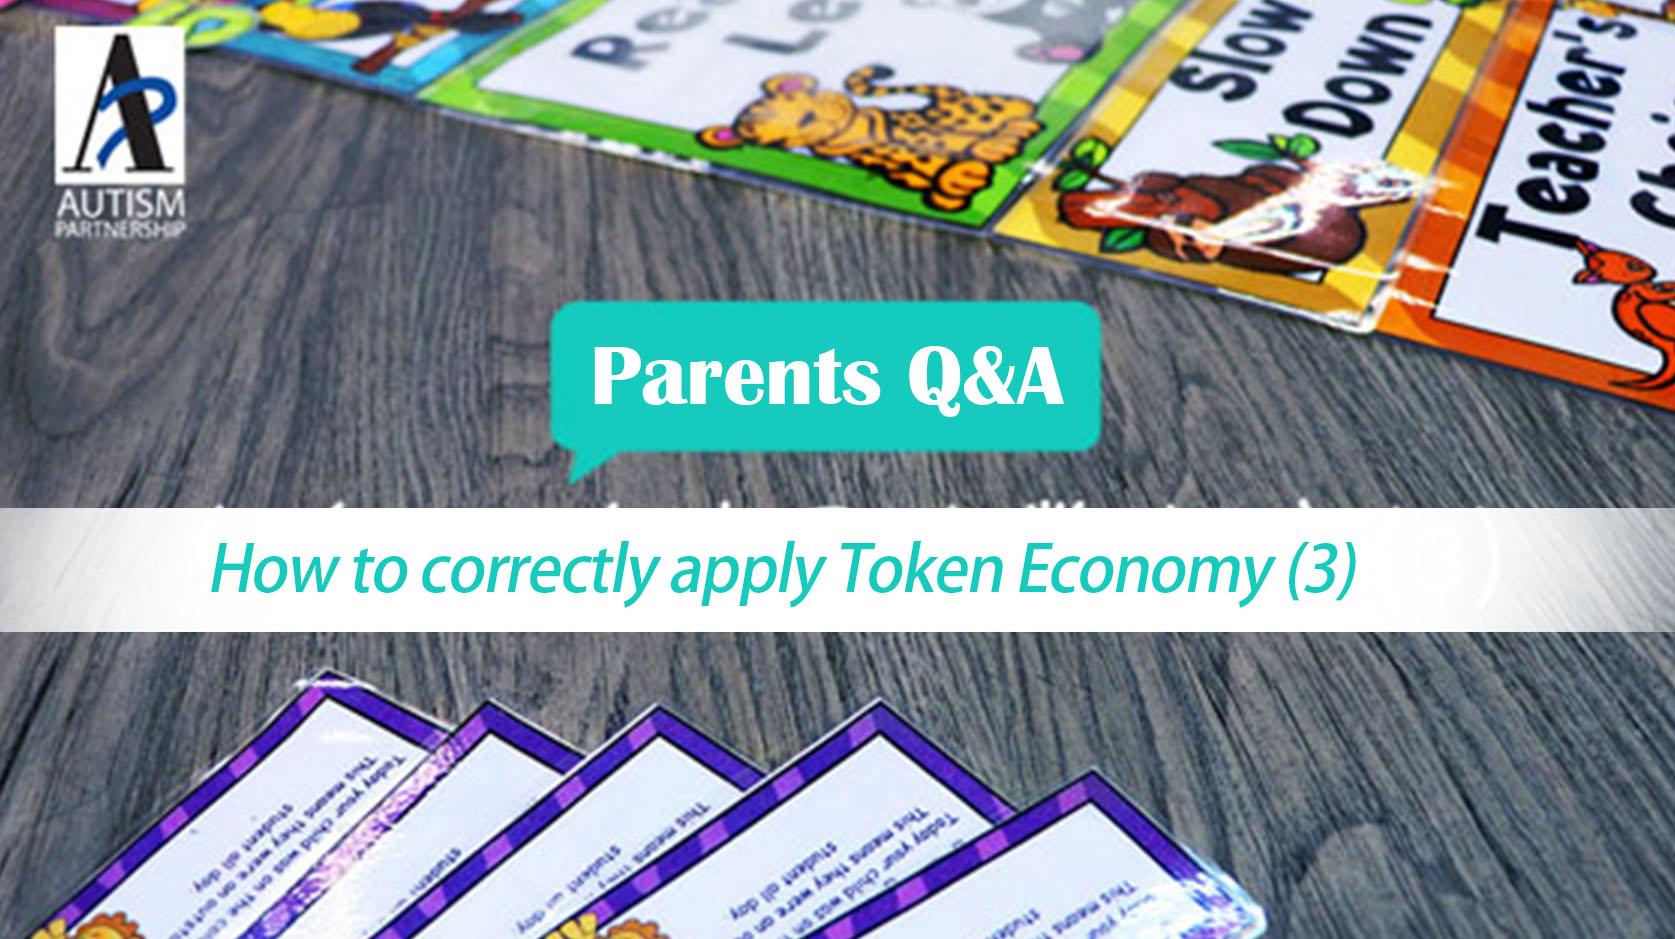 autism-partnership-parents-qa-aba-how-to-correctly-apply-token-economy-3-1